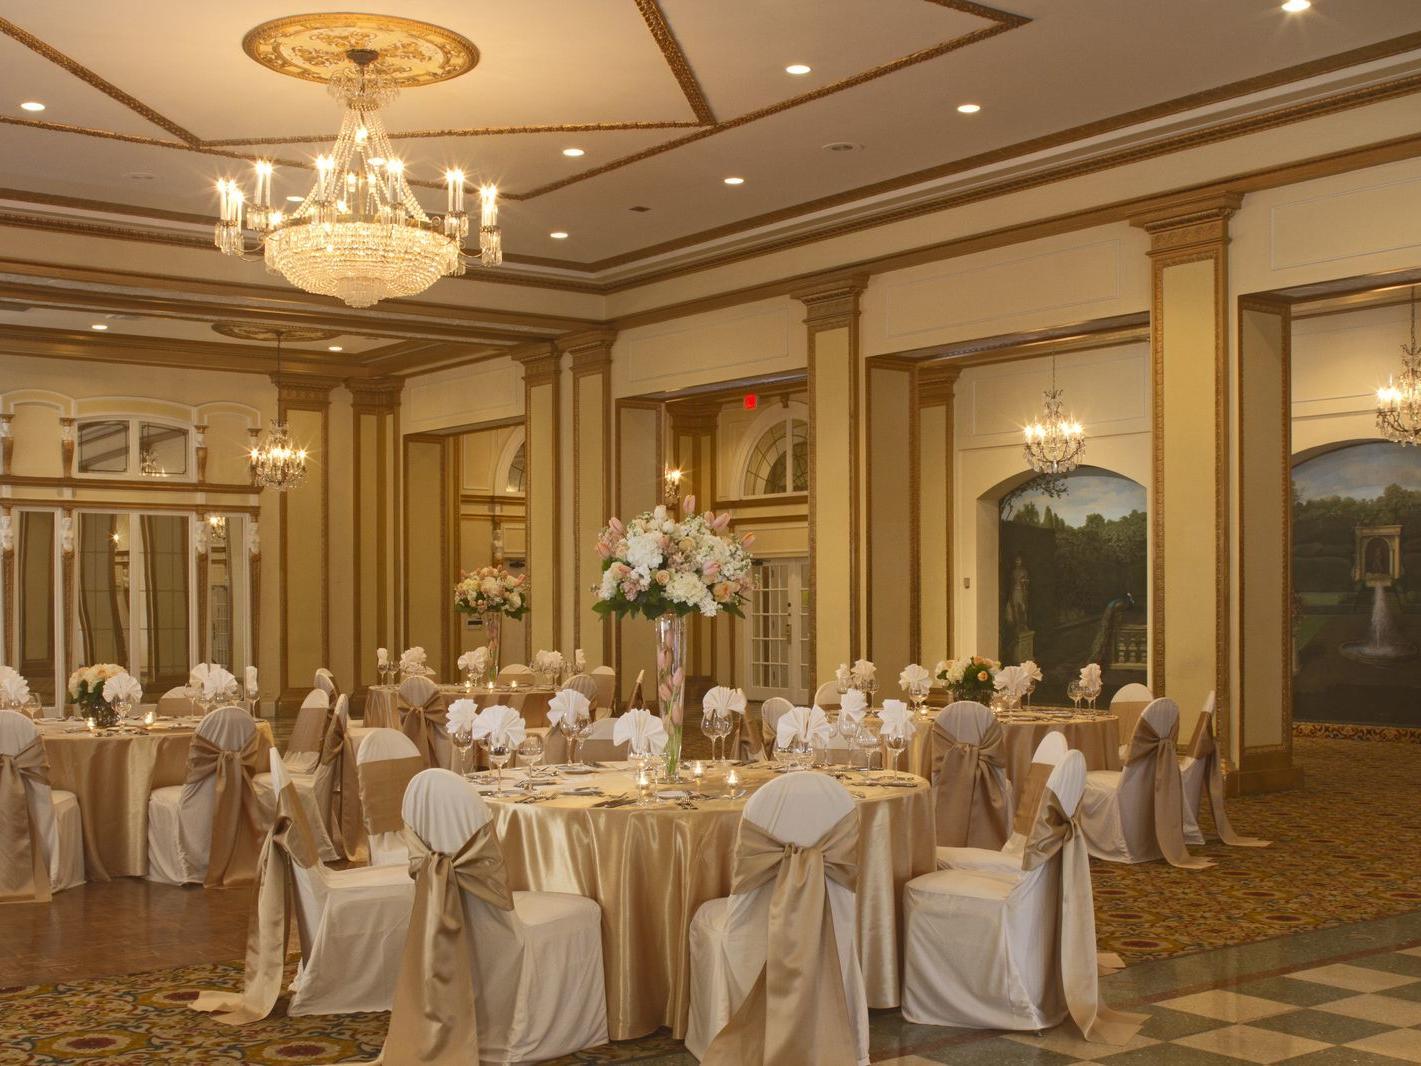 Venetian Ballroom Set For Wedding Reception